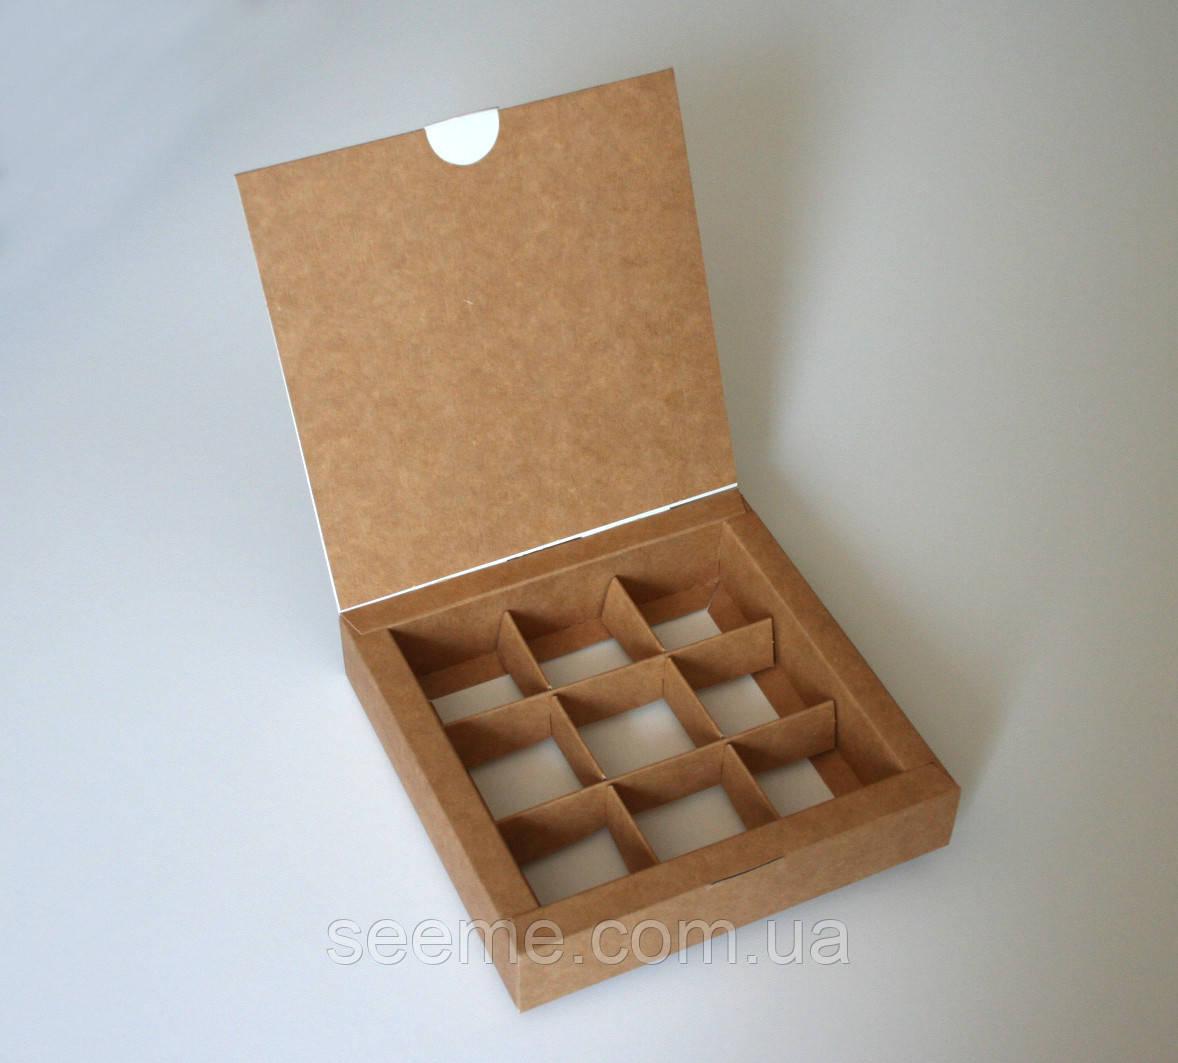 Коробка подарочная из крафт картона для 9 конфет 150х150х30 мм.